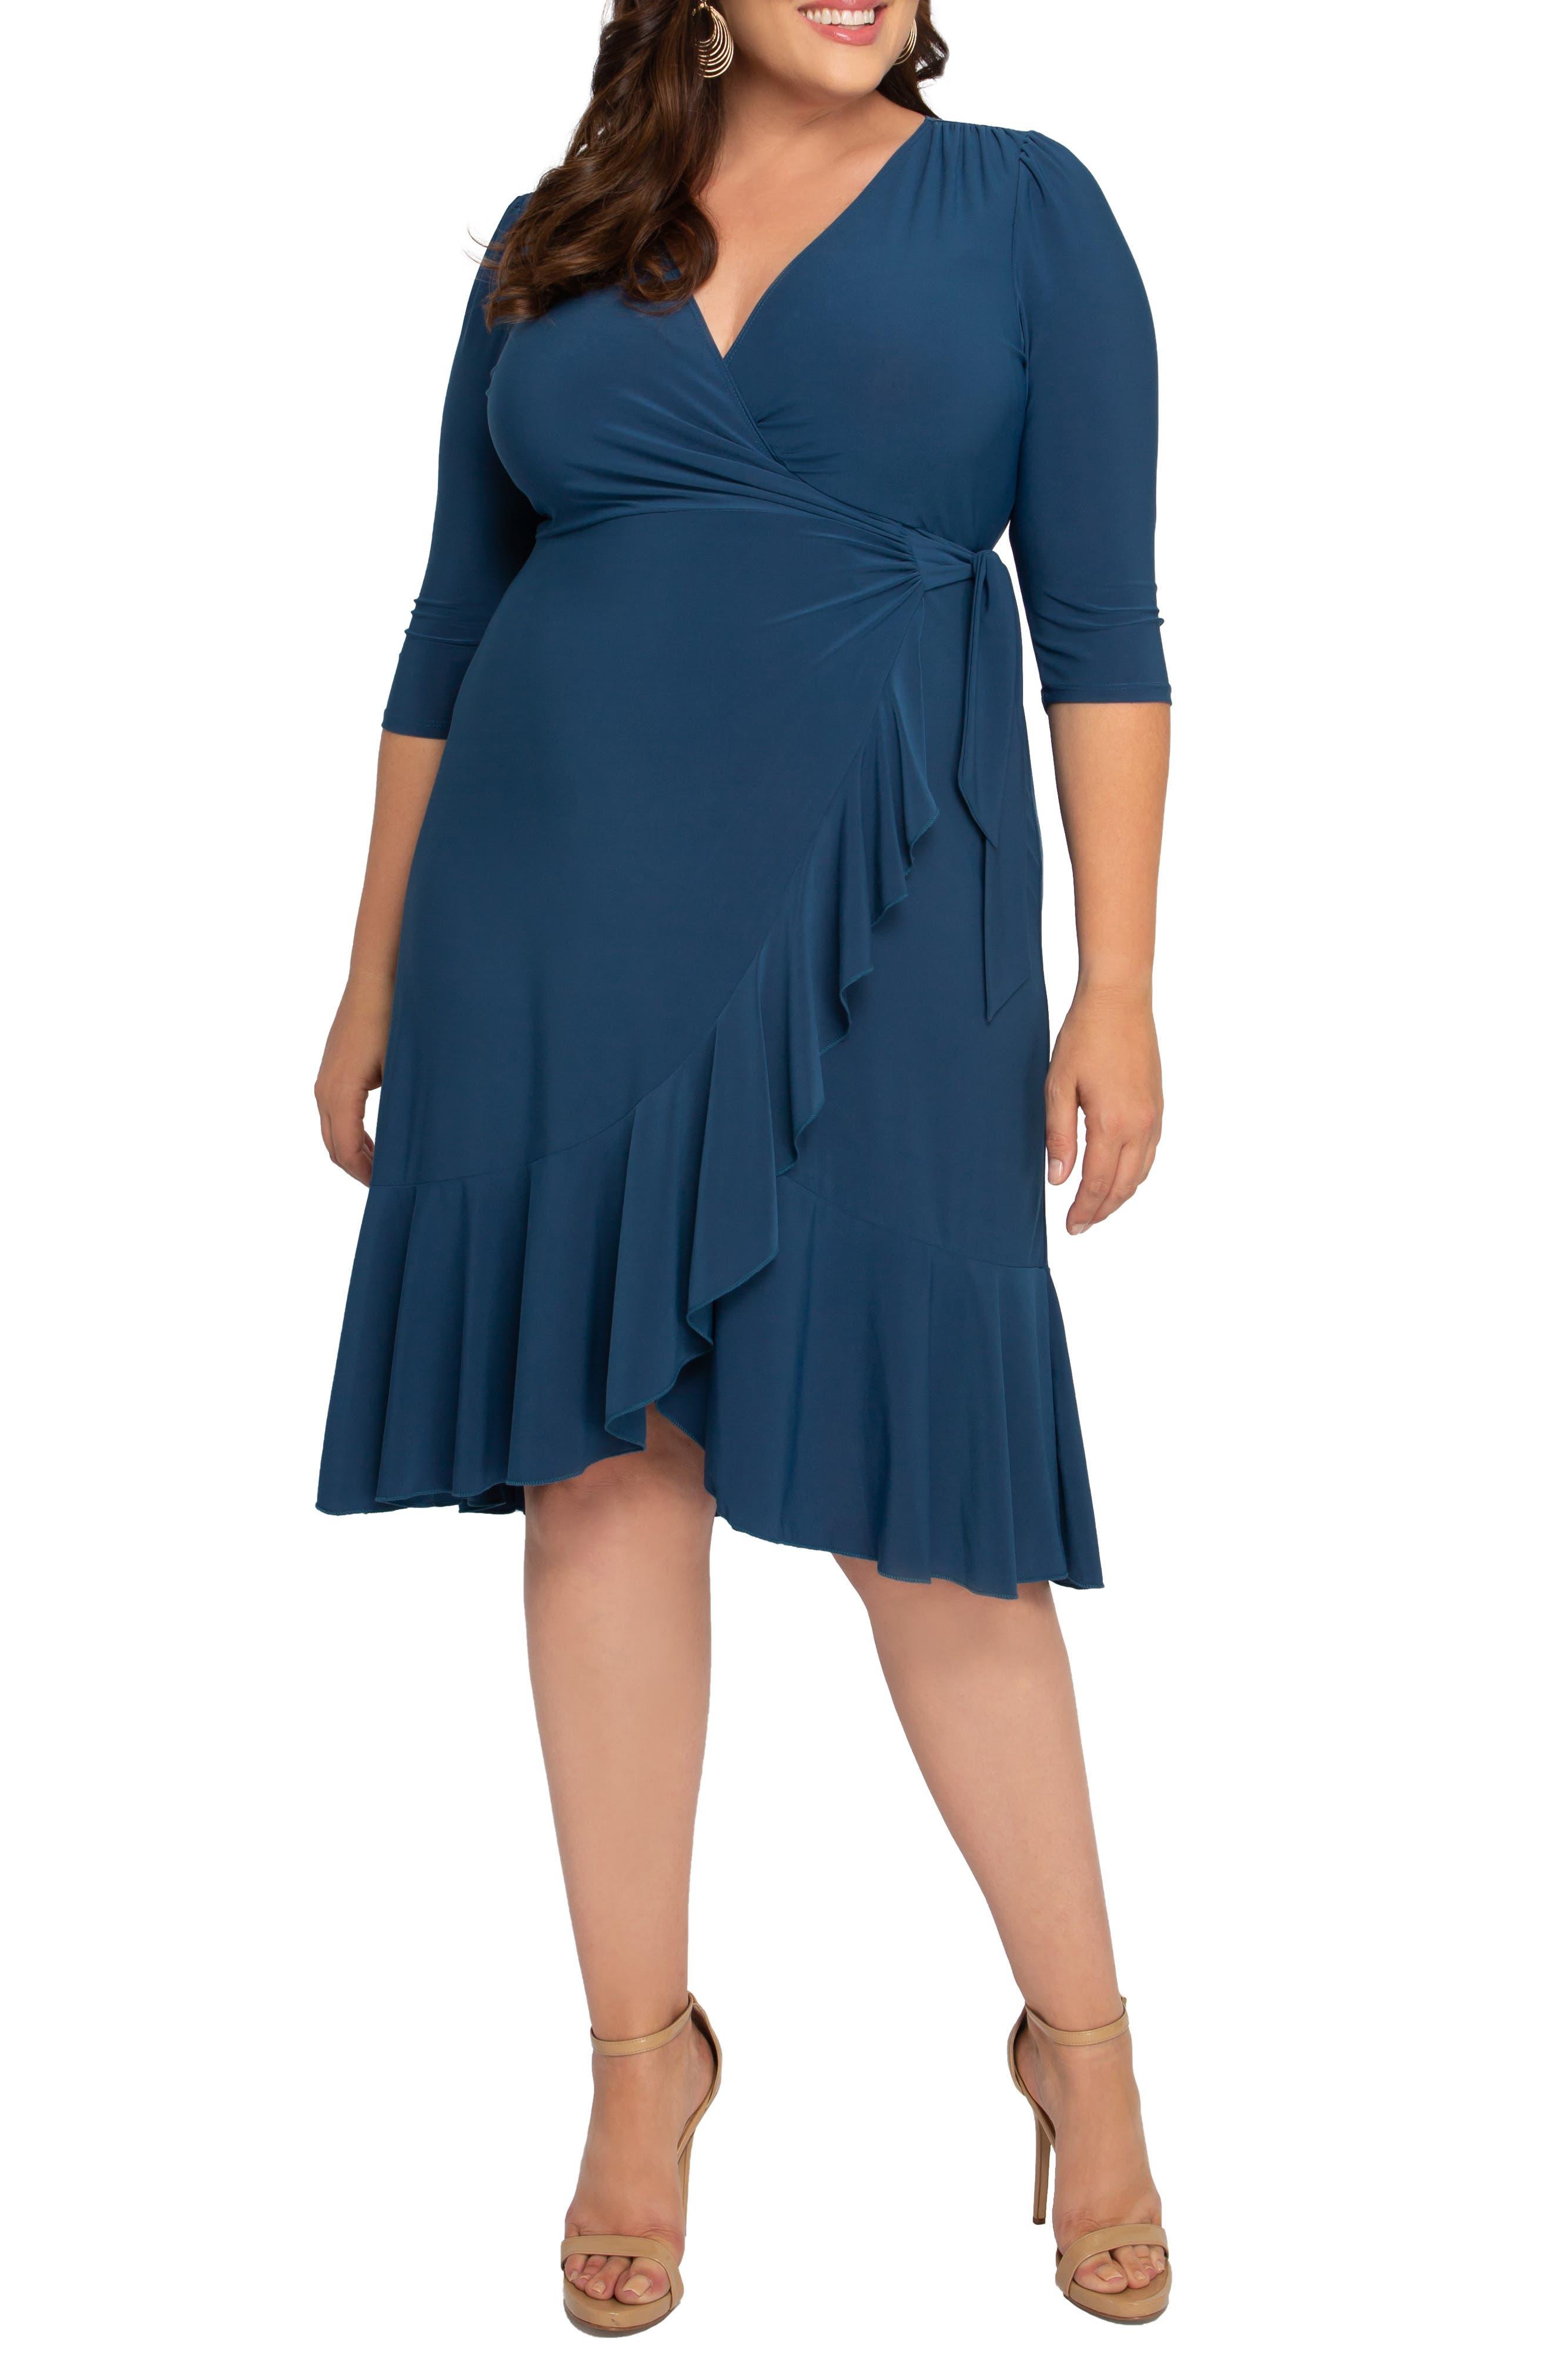 Whimsy Wrap Dress